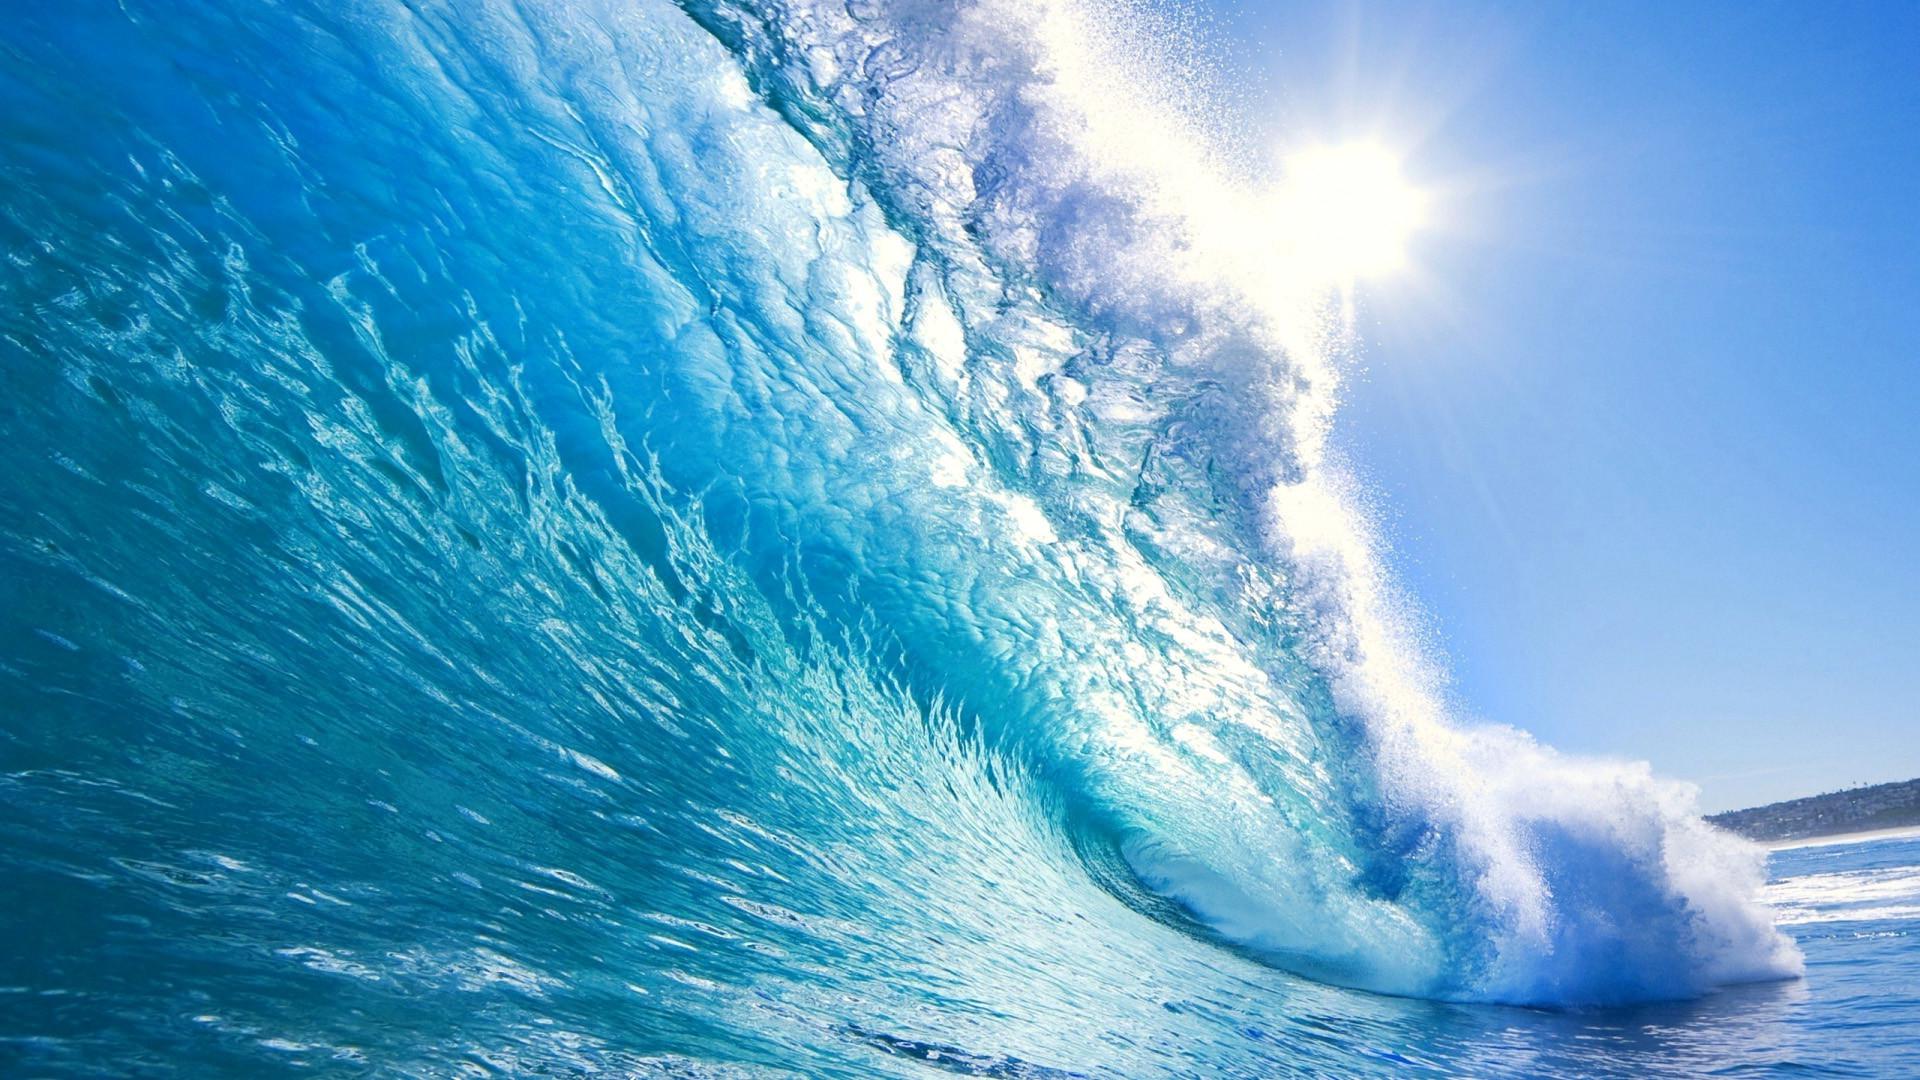 Res: 1920x1080, Ocean waves desktop background wallpaper HD.